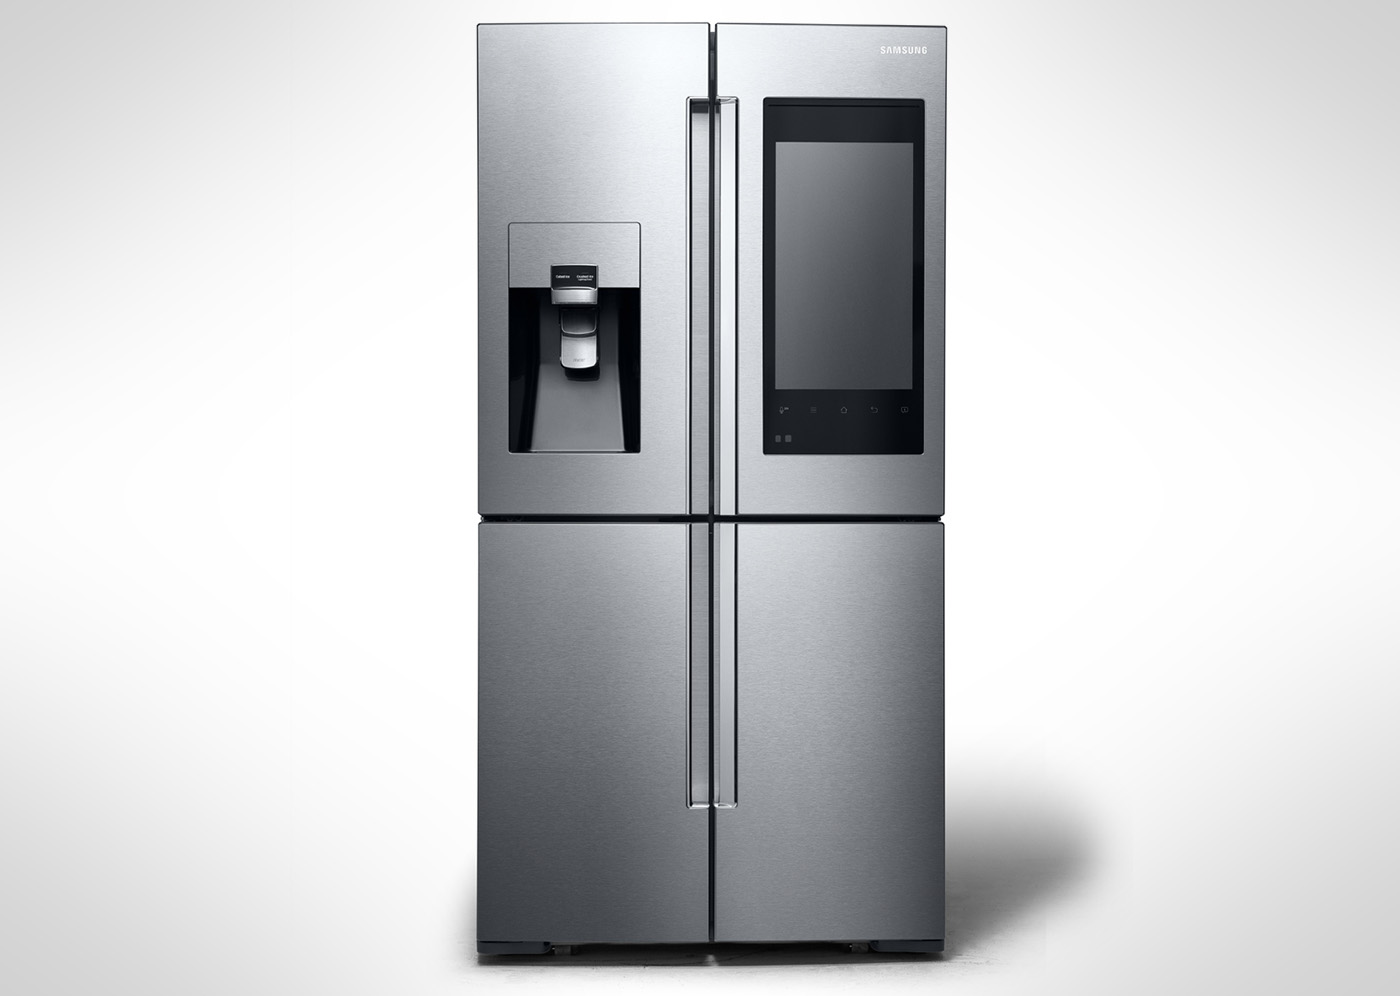 Samsung\'s latest smart fridge has cameras and a huge display